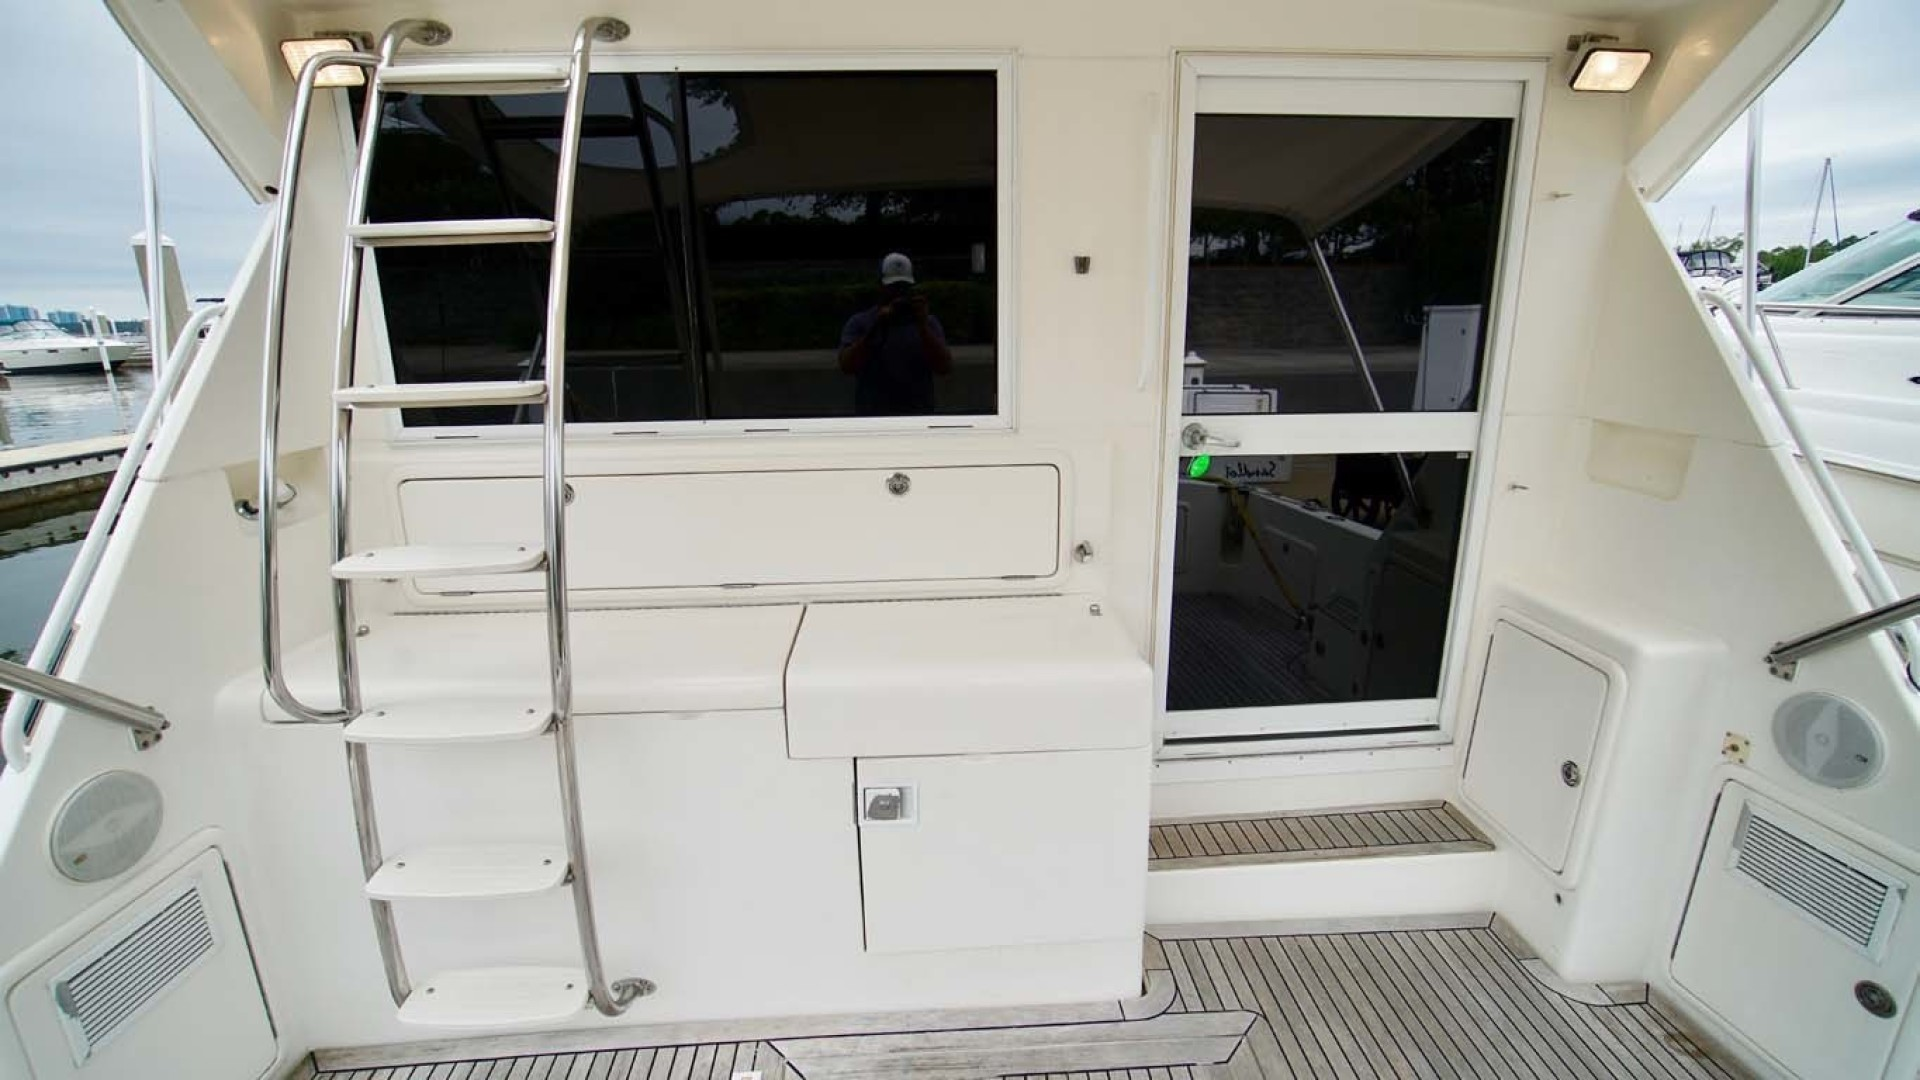 Riviera-43 Flybridge 2001-Sawbones Orange Beach-Alabama-United States-Cockpit-1413462   Thumbnail